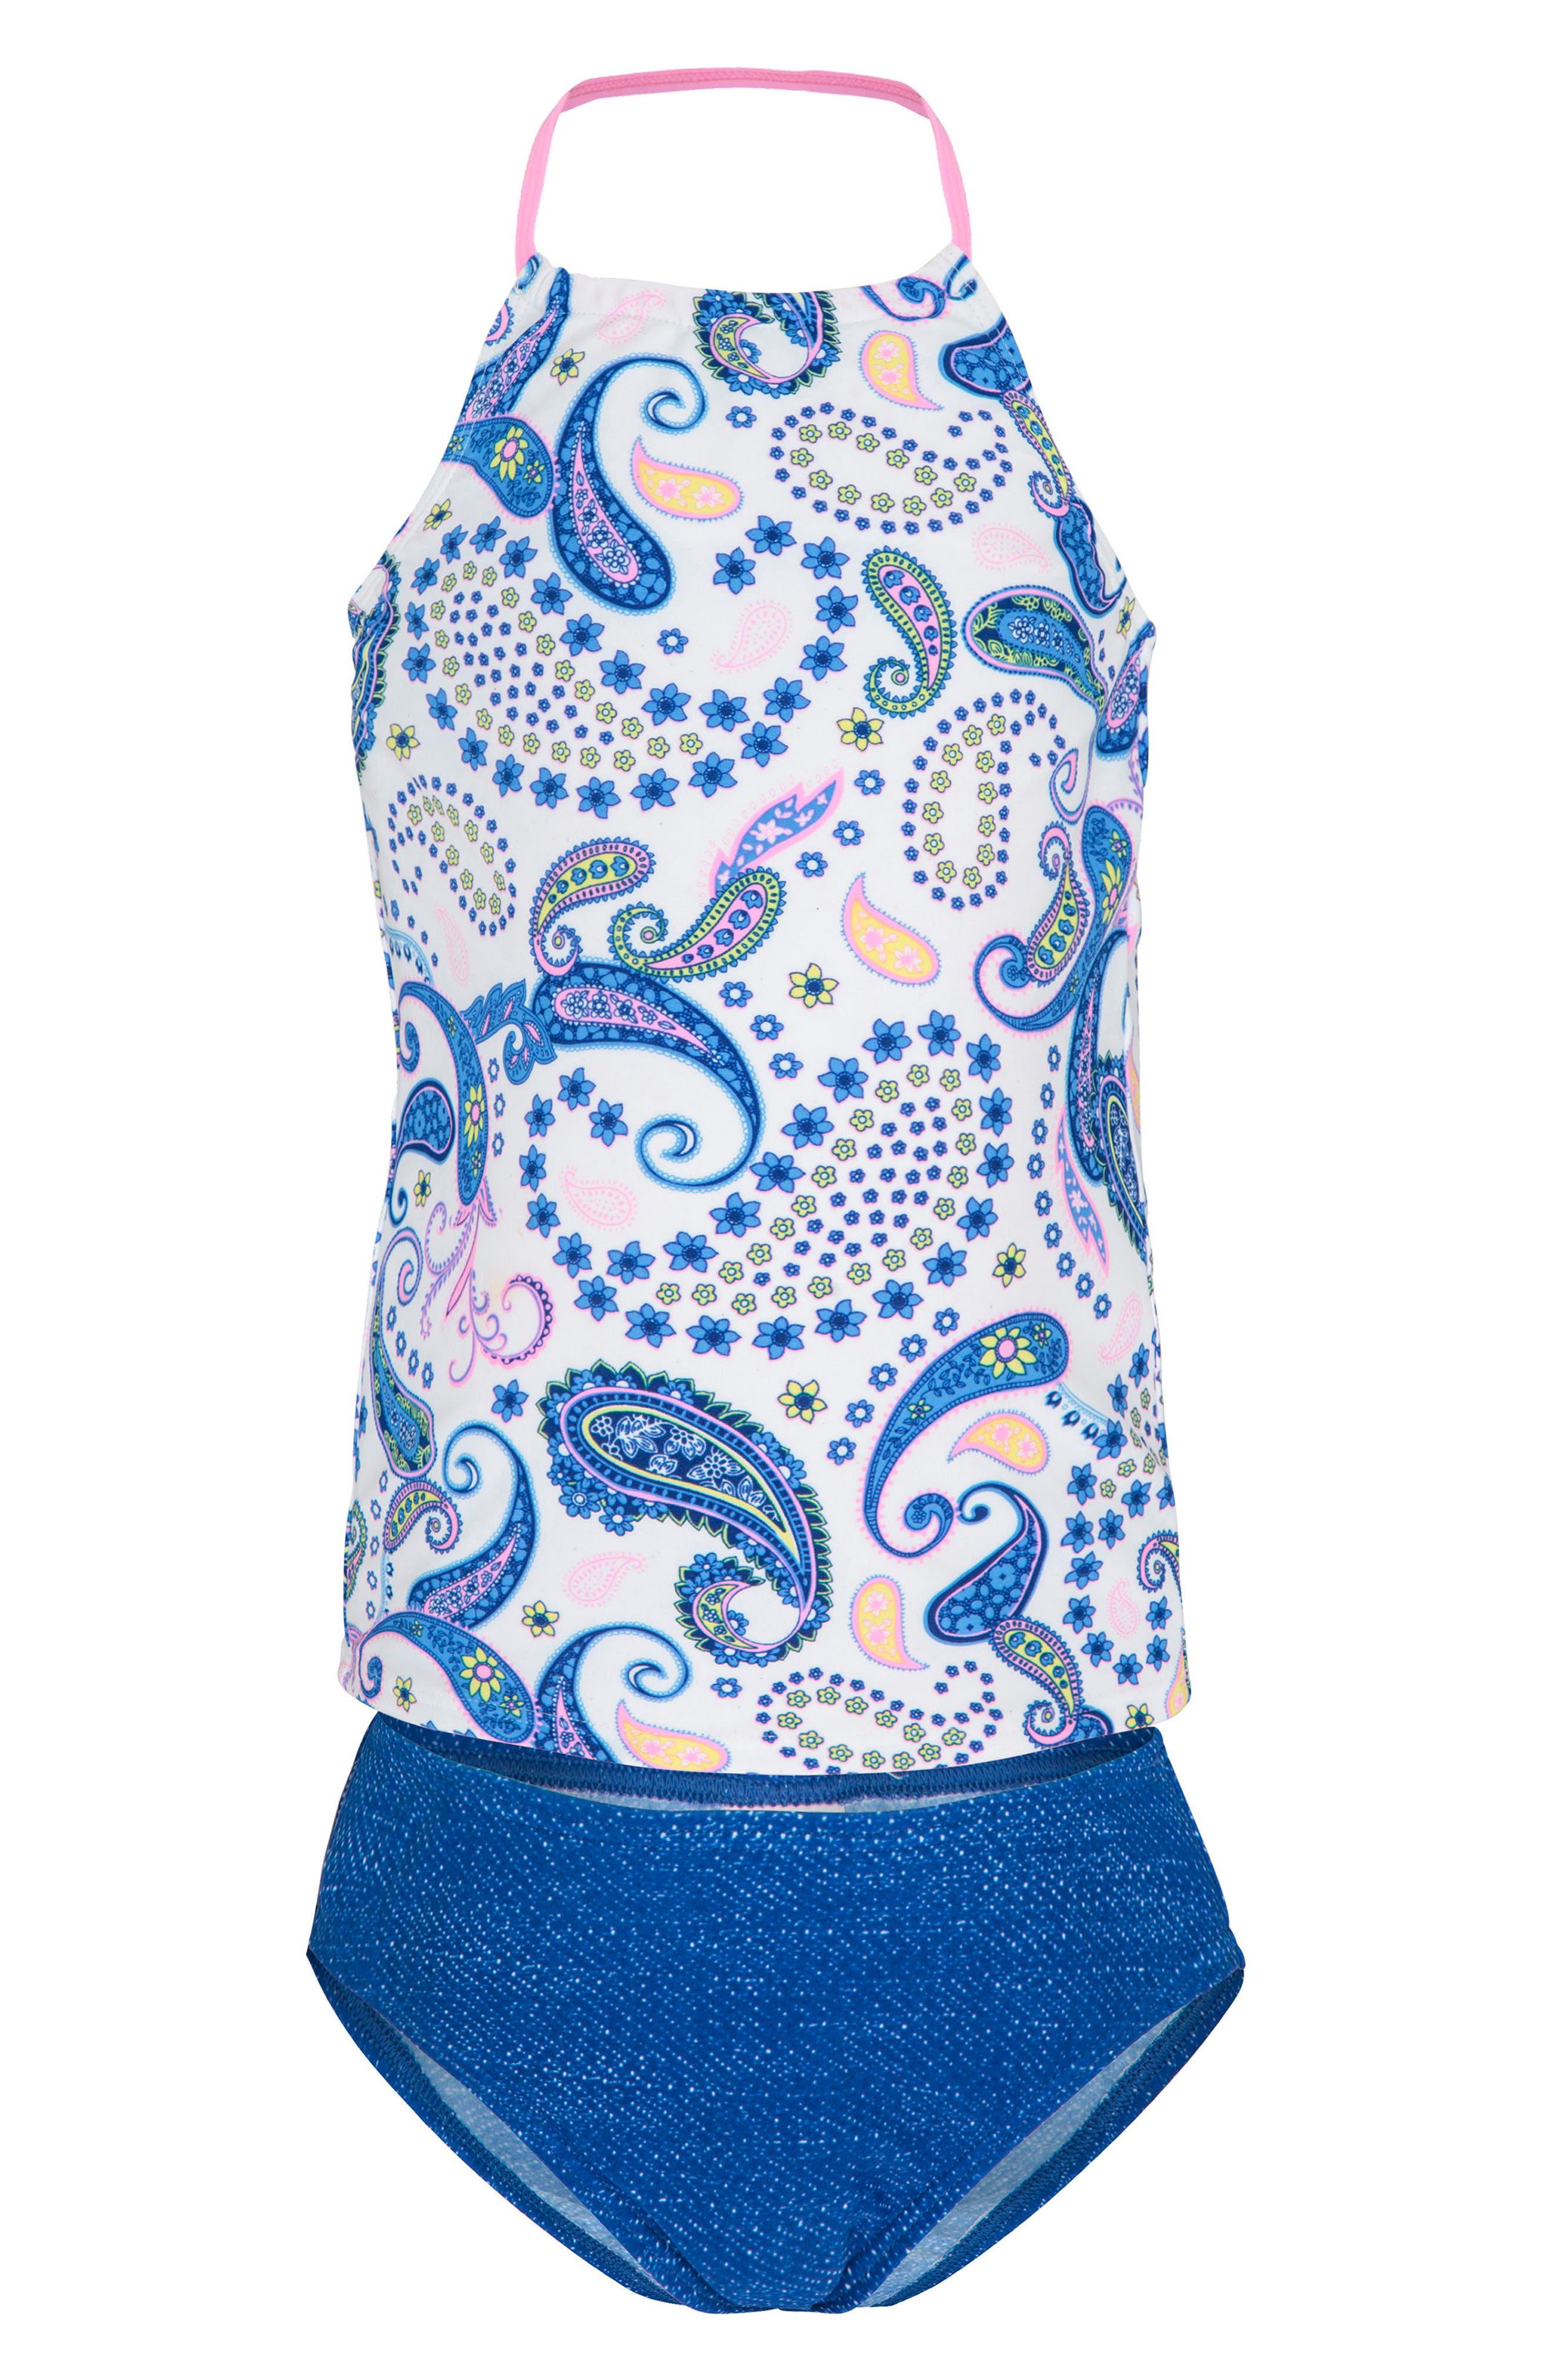 Two-Piece Tankini Swimsuit,                         Main,                         color, Boho Paisley